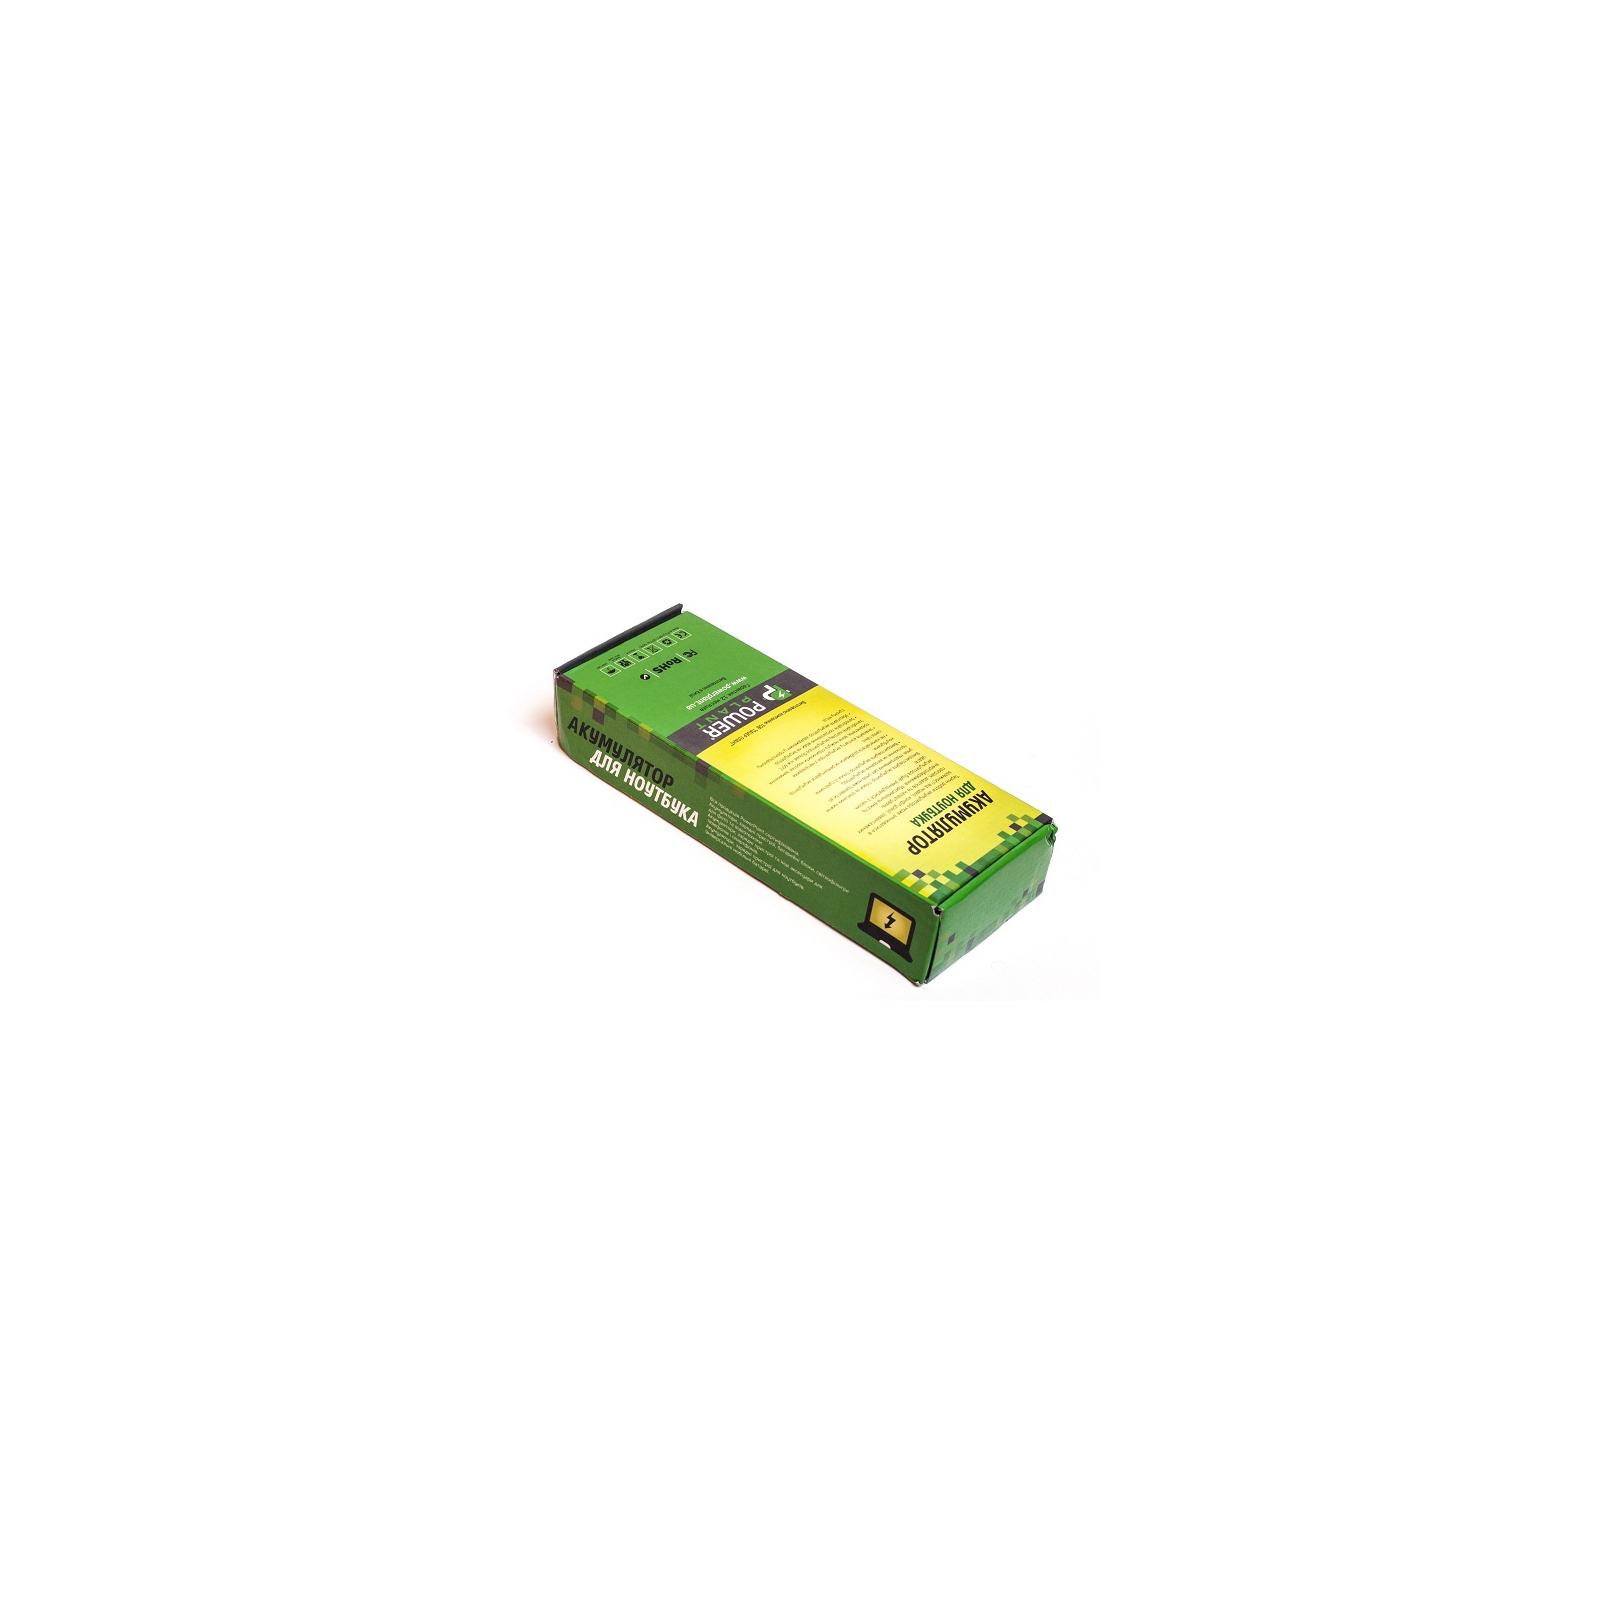 Аккумулятор для ноутбука ASUS A32-K52 (A32-K52, ASA420LH) 10.8V 5200mAh PowerPlant (NB00000043) изображение 2